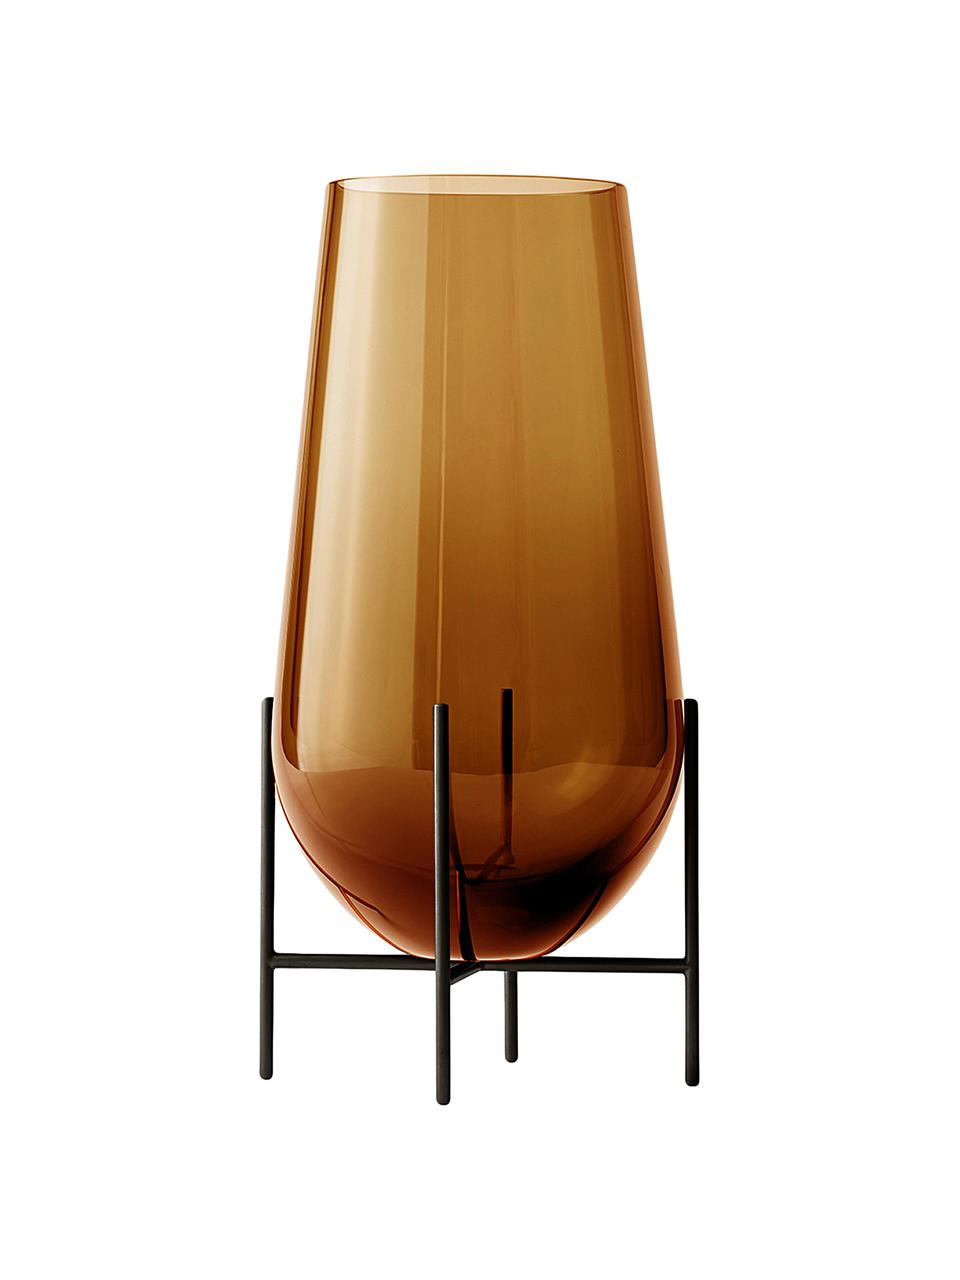 Mondgeblazen vloervaas Échasse, Frame: messing, Vaas: mondgeblazen glas, Vaas: bruin. Frame: roestkleurig, Ø 30 x H 60 cm